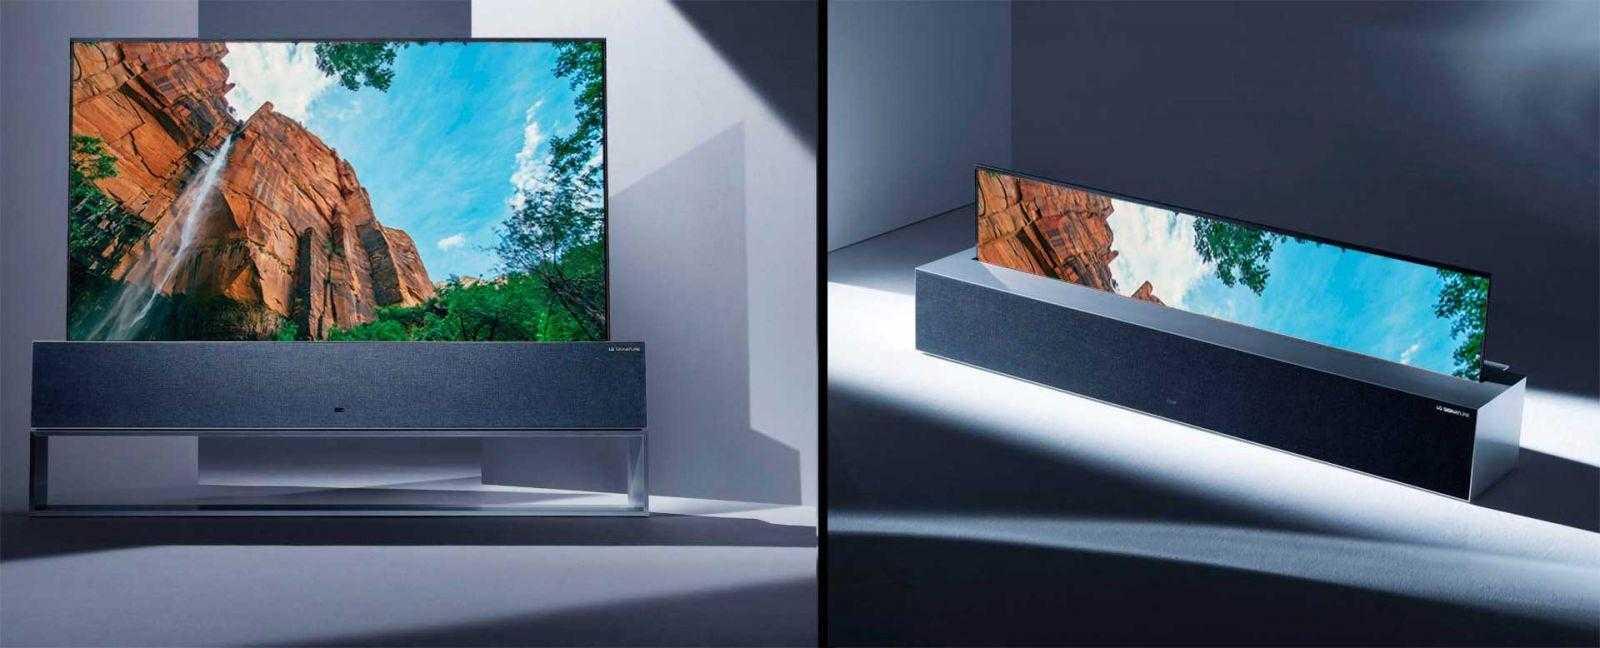 Cворачивающийся телевизор LG скоро появится в России